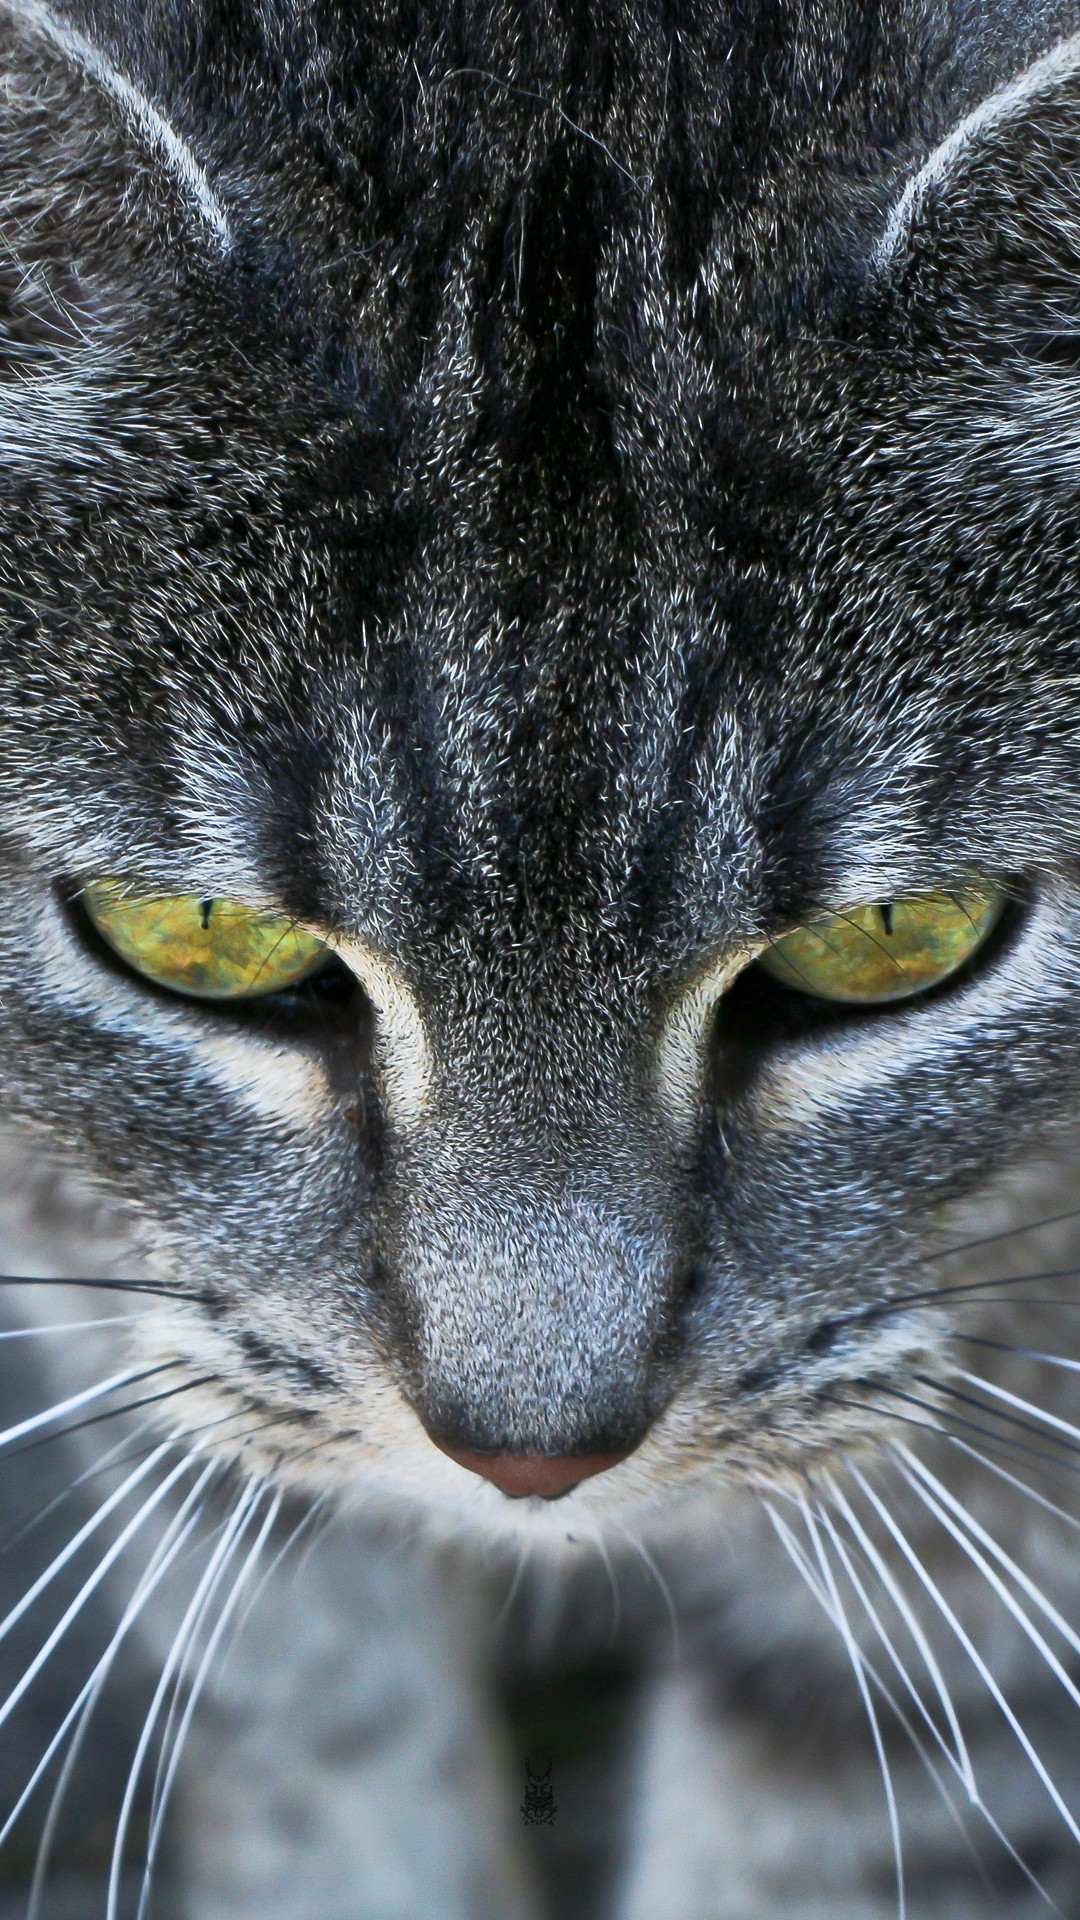 Animals iPhone 6 Plus Wallpapers – Grey Cat Ember Eyes iPhone 6 Plus HD  Wallpaper #